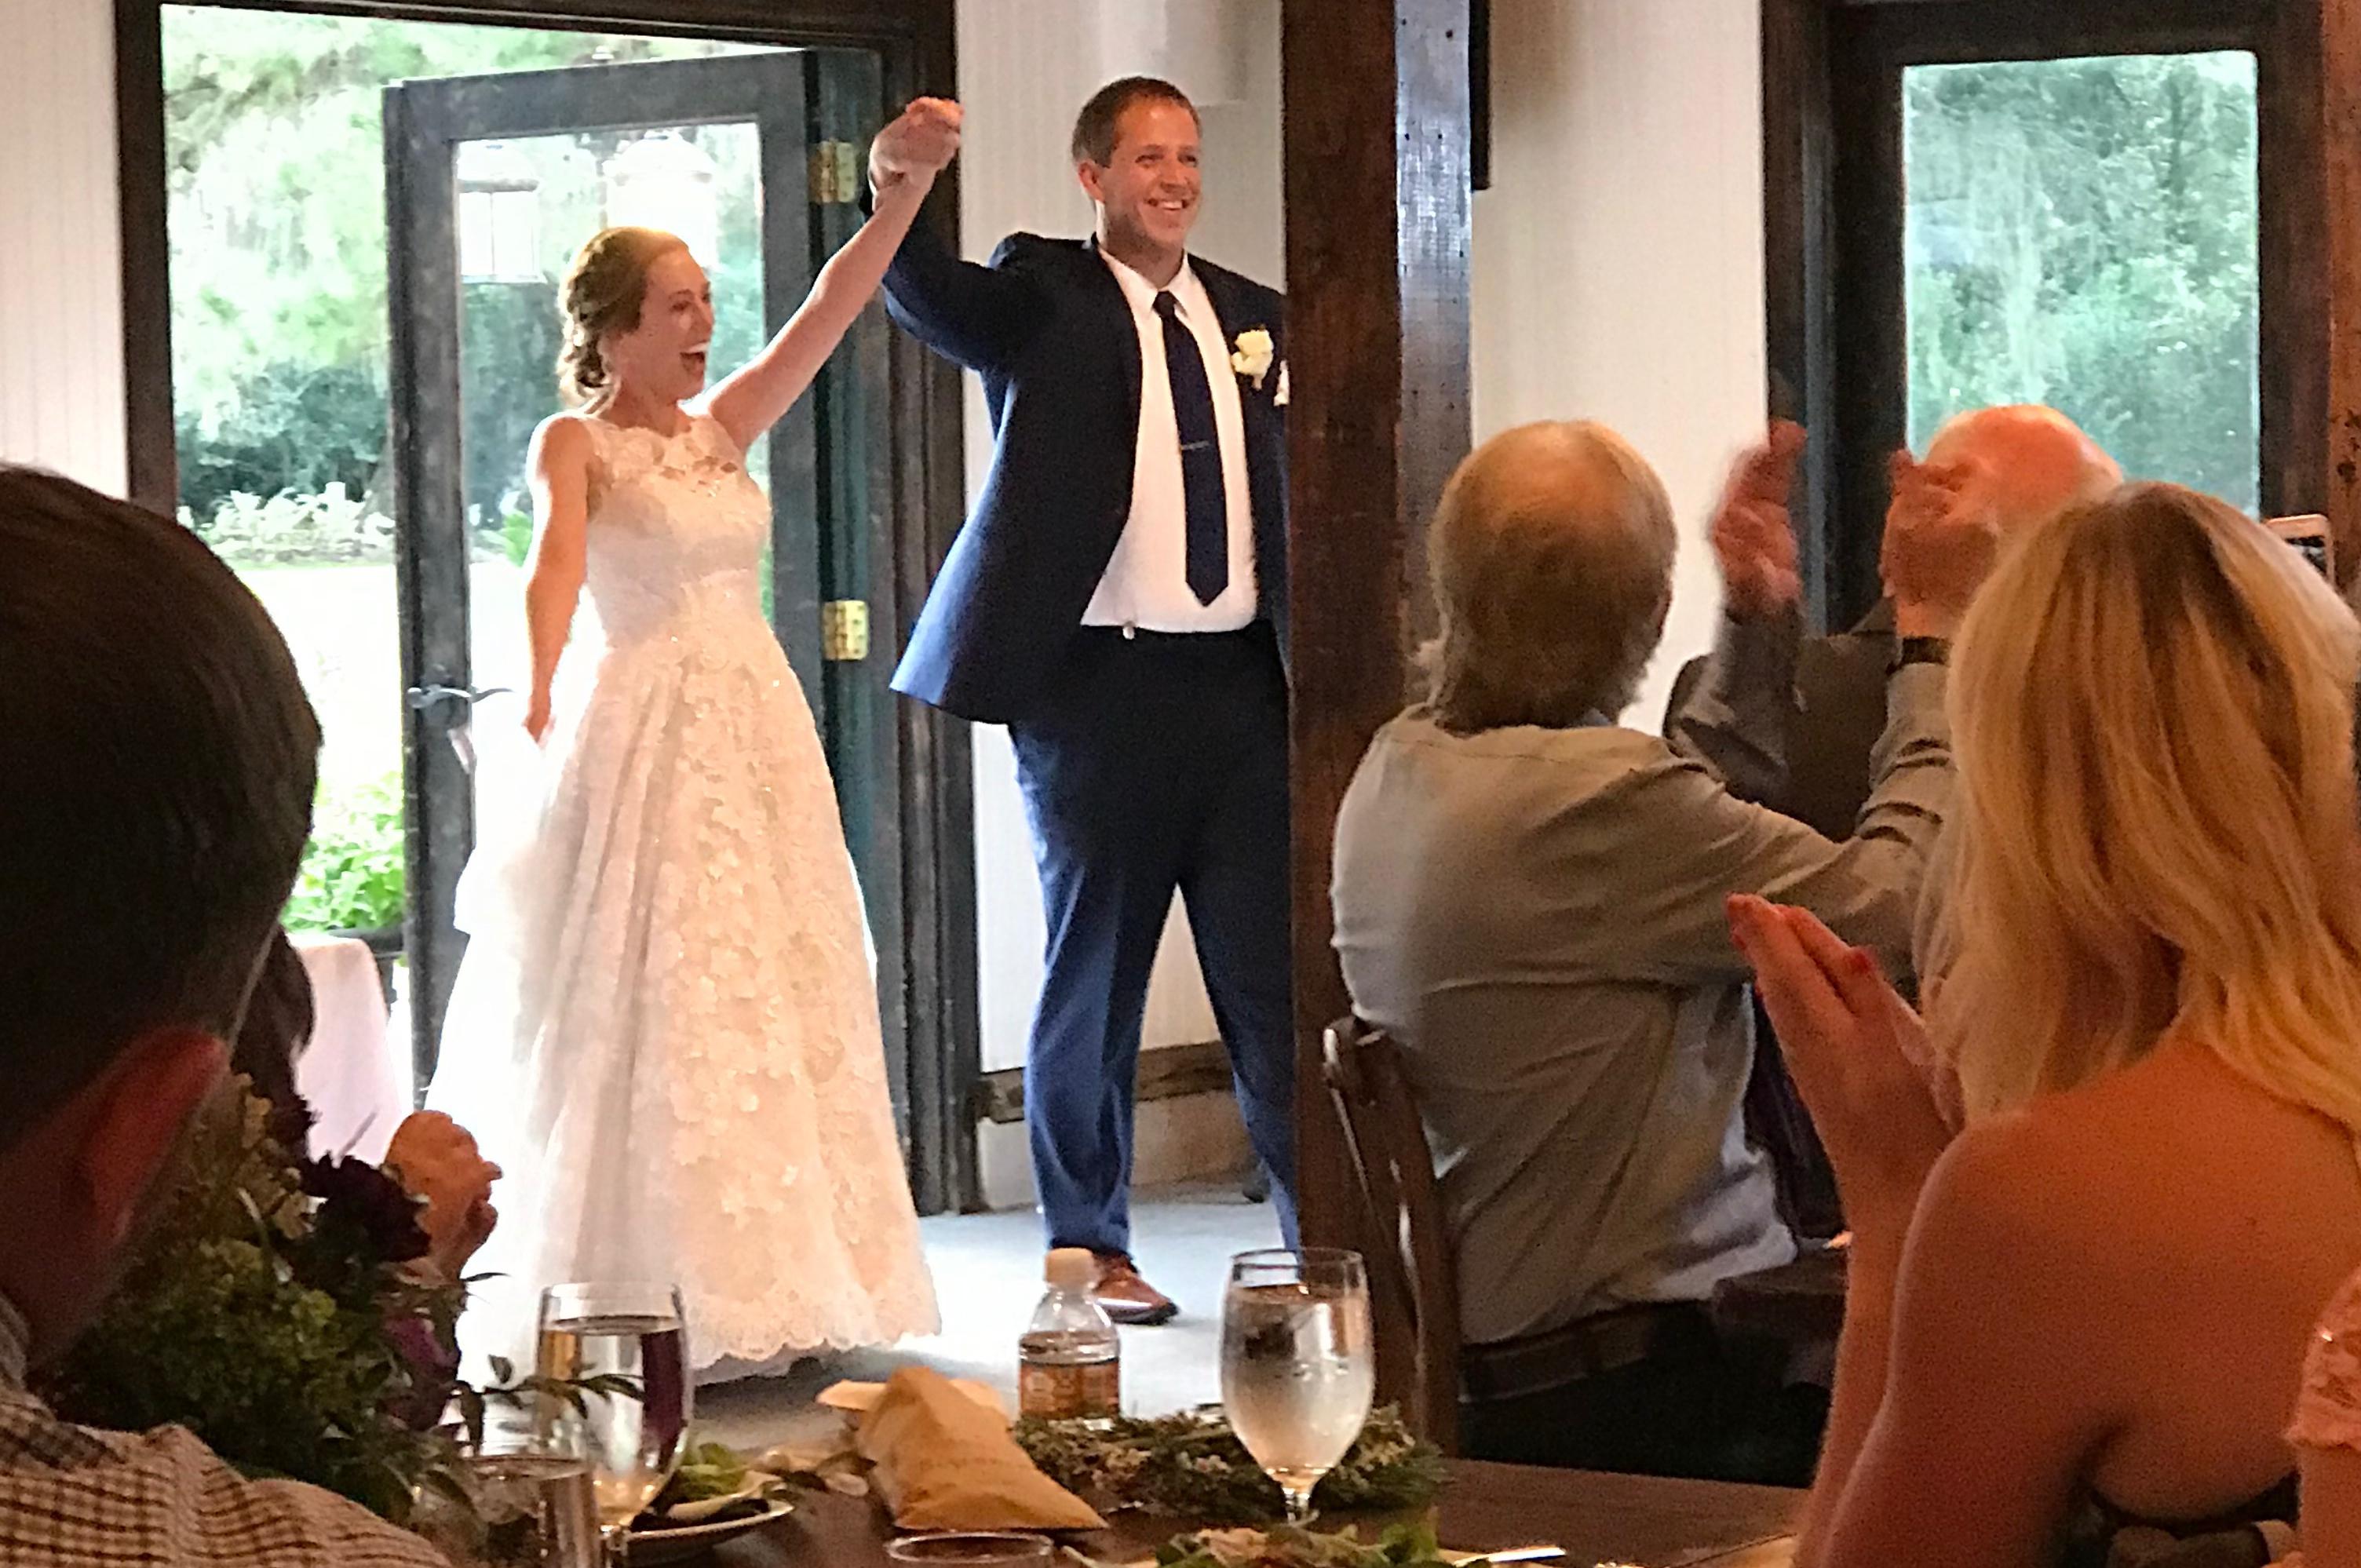 Matthew Urey and his new wife Lauren at their wedding on October 18.